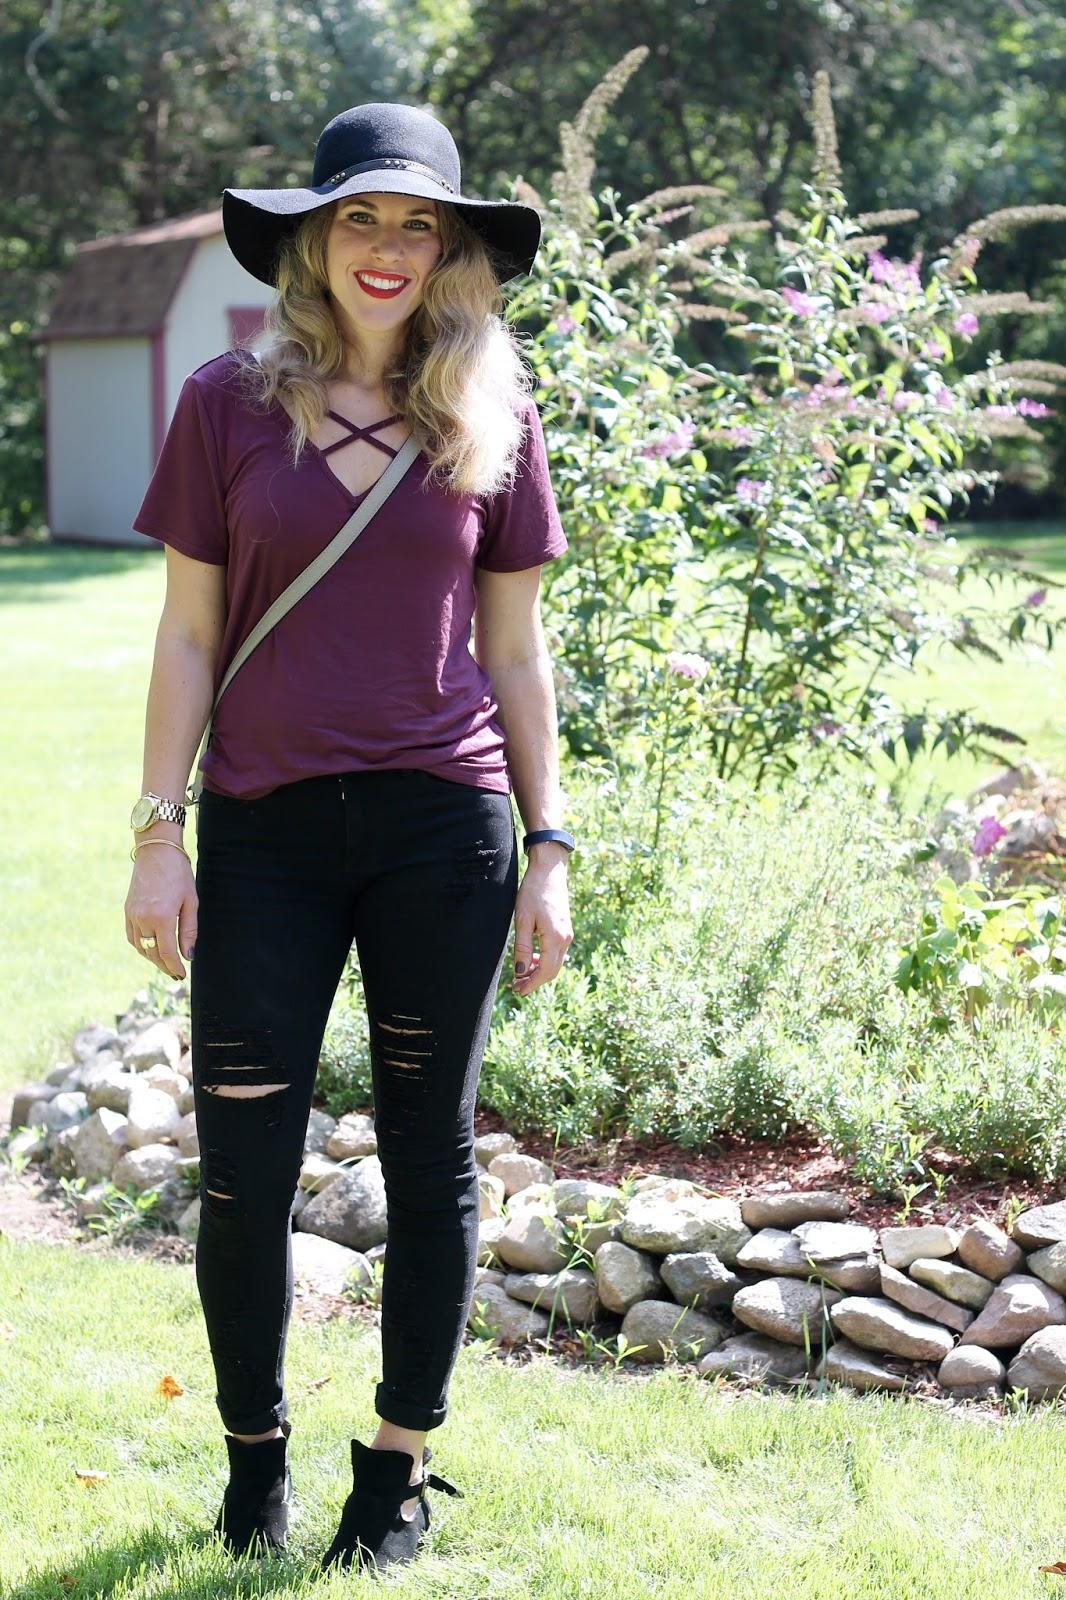 burgundy criss cross top, distressed black jeans, black booties, black floppy hat, grey saddlebag